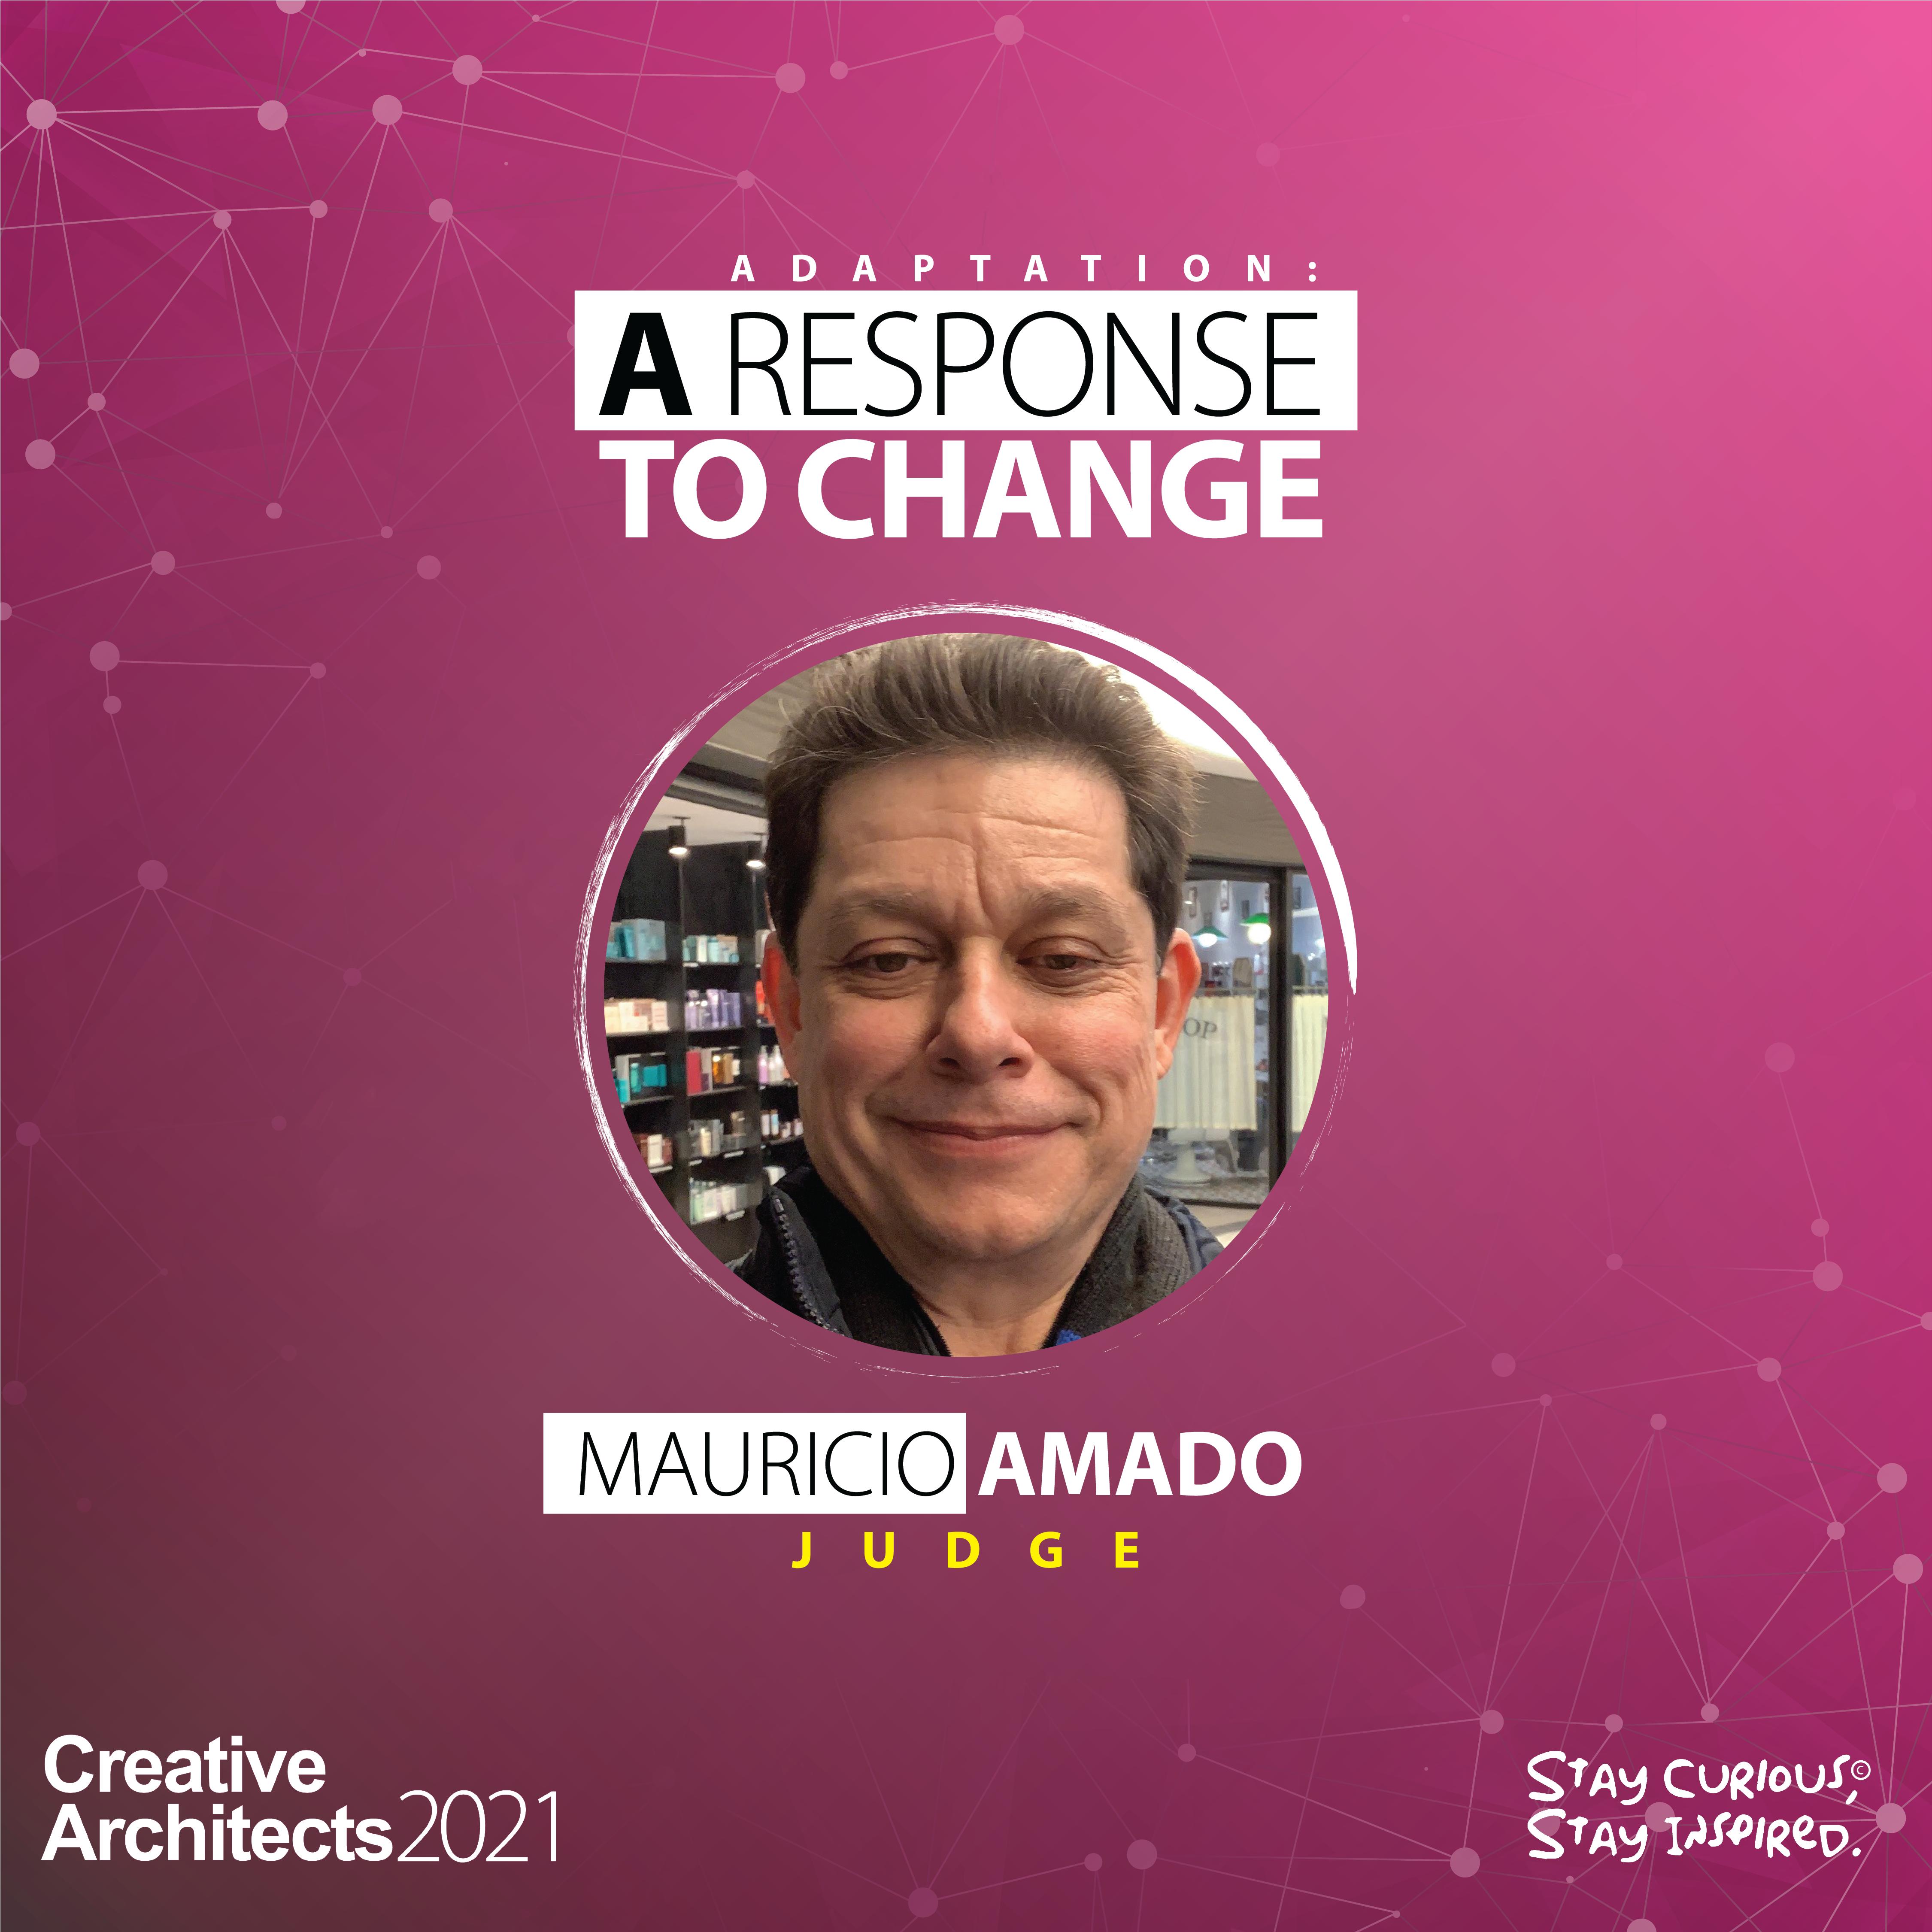 Mauricio-Amado-Creative-Architects-The-Competition-2021-Judge